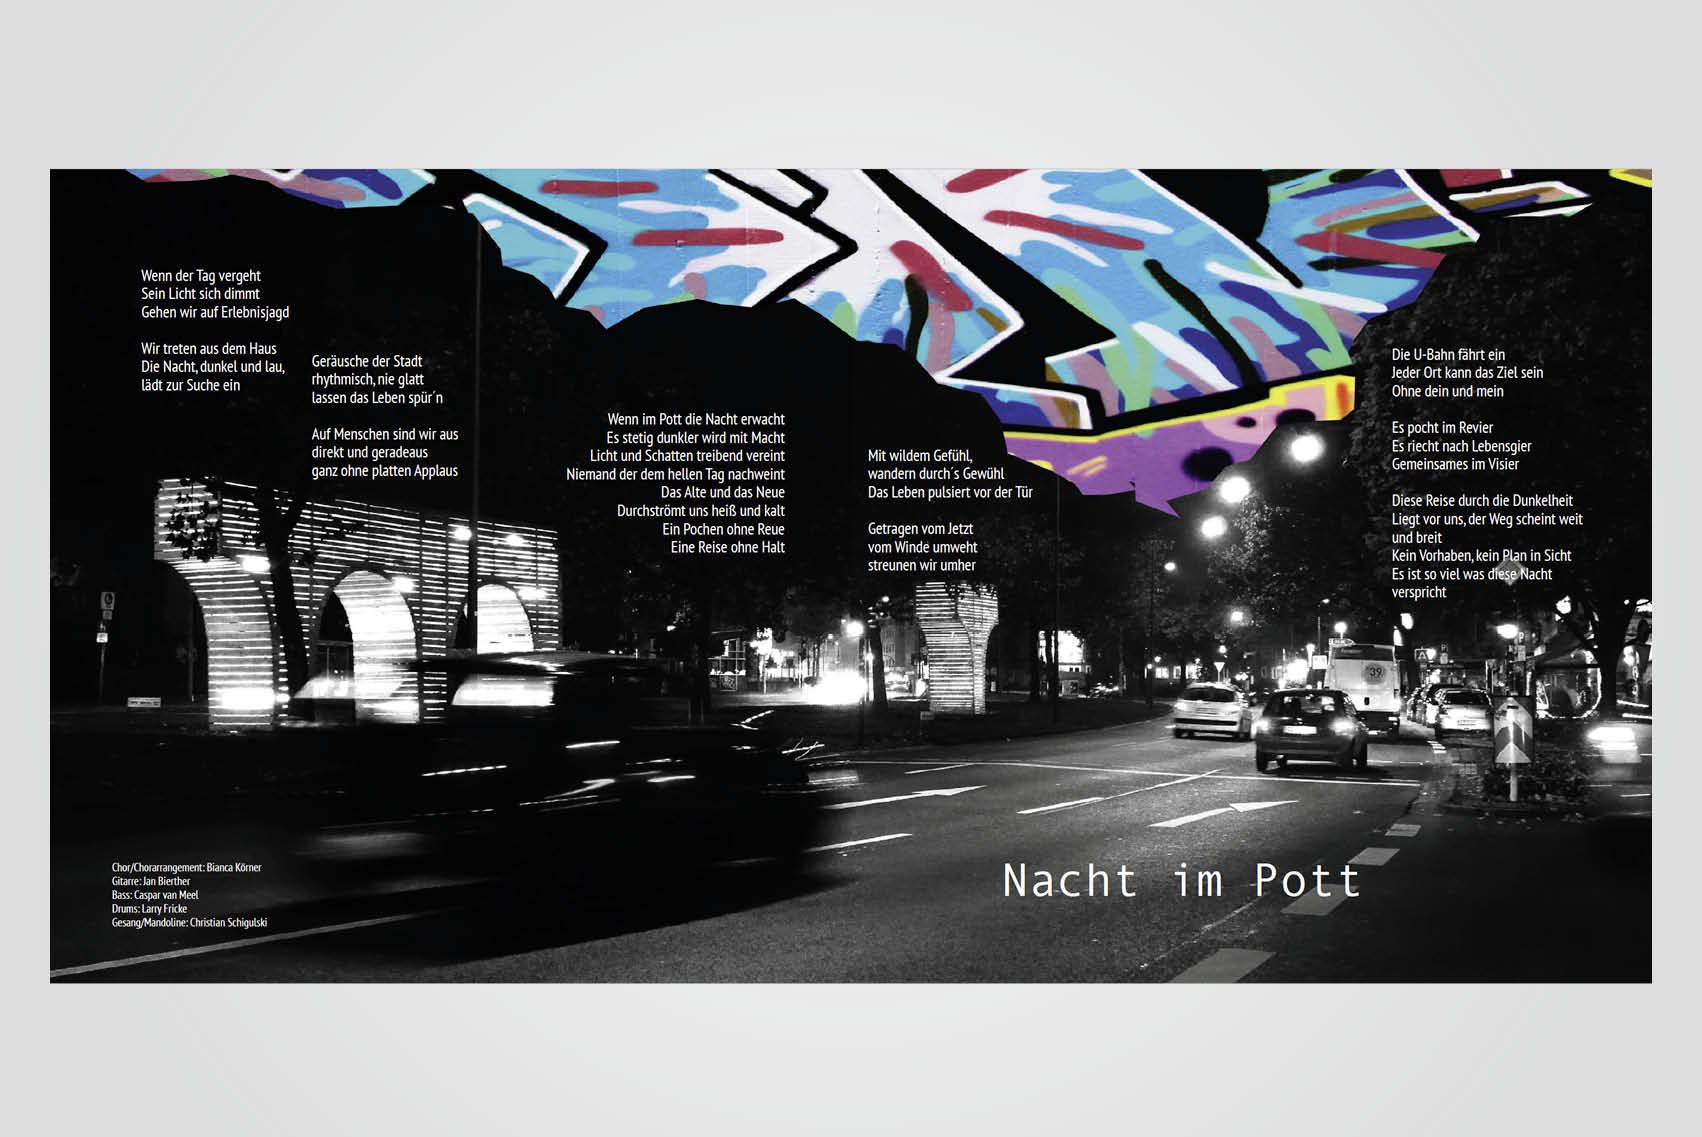 corporate-design-schigulski-musik-10.jpg